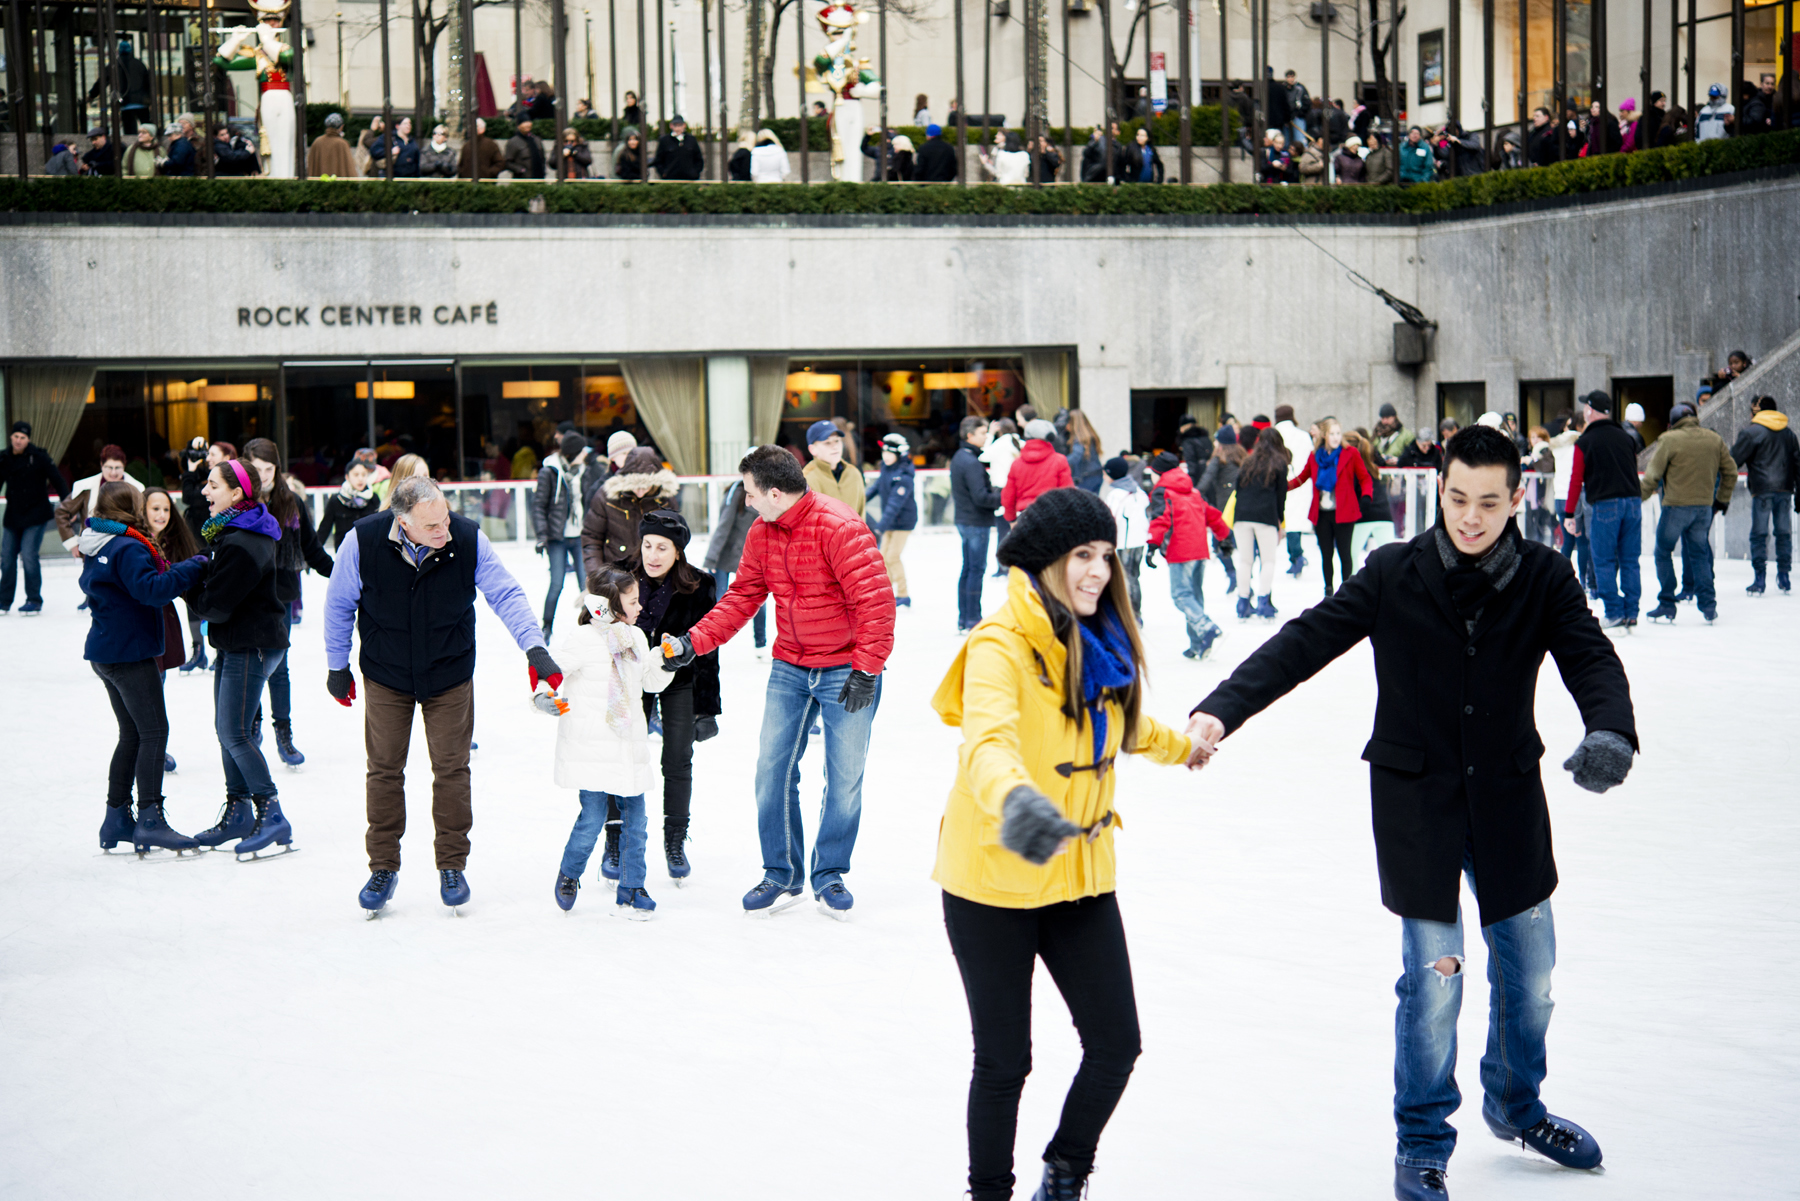 Family-Friendly Spring Break Deals Allow Kids to Skate for Free at The Rink at Rockefeller Center